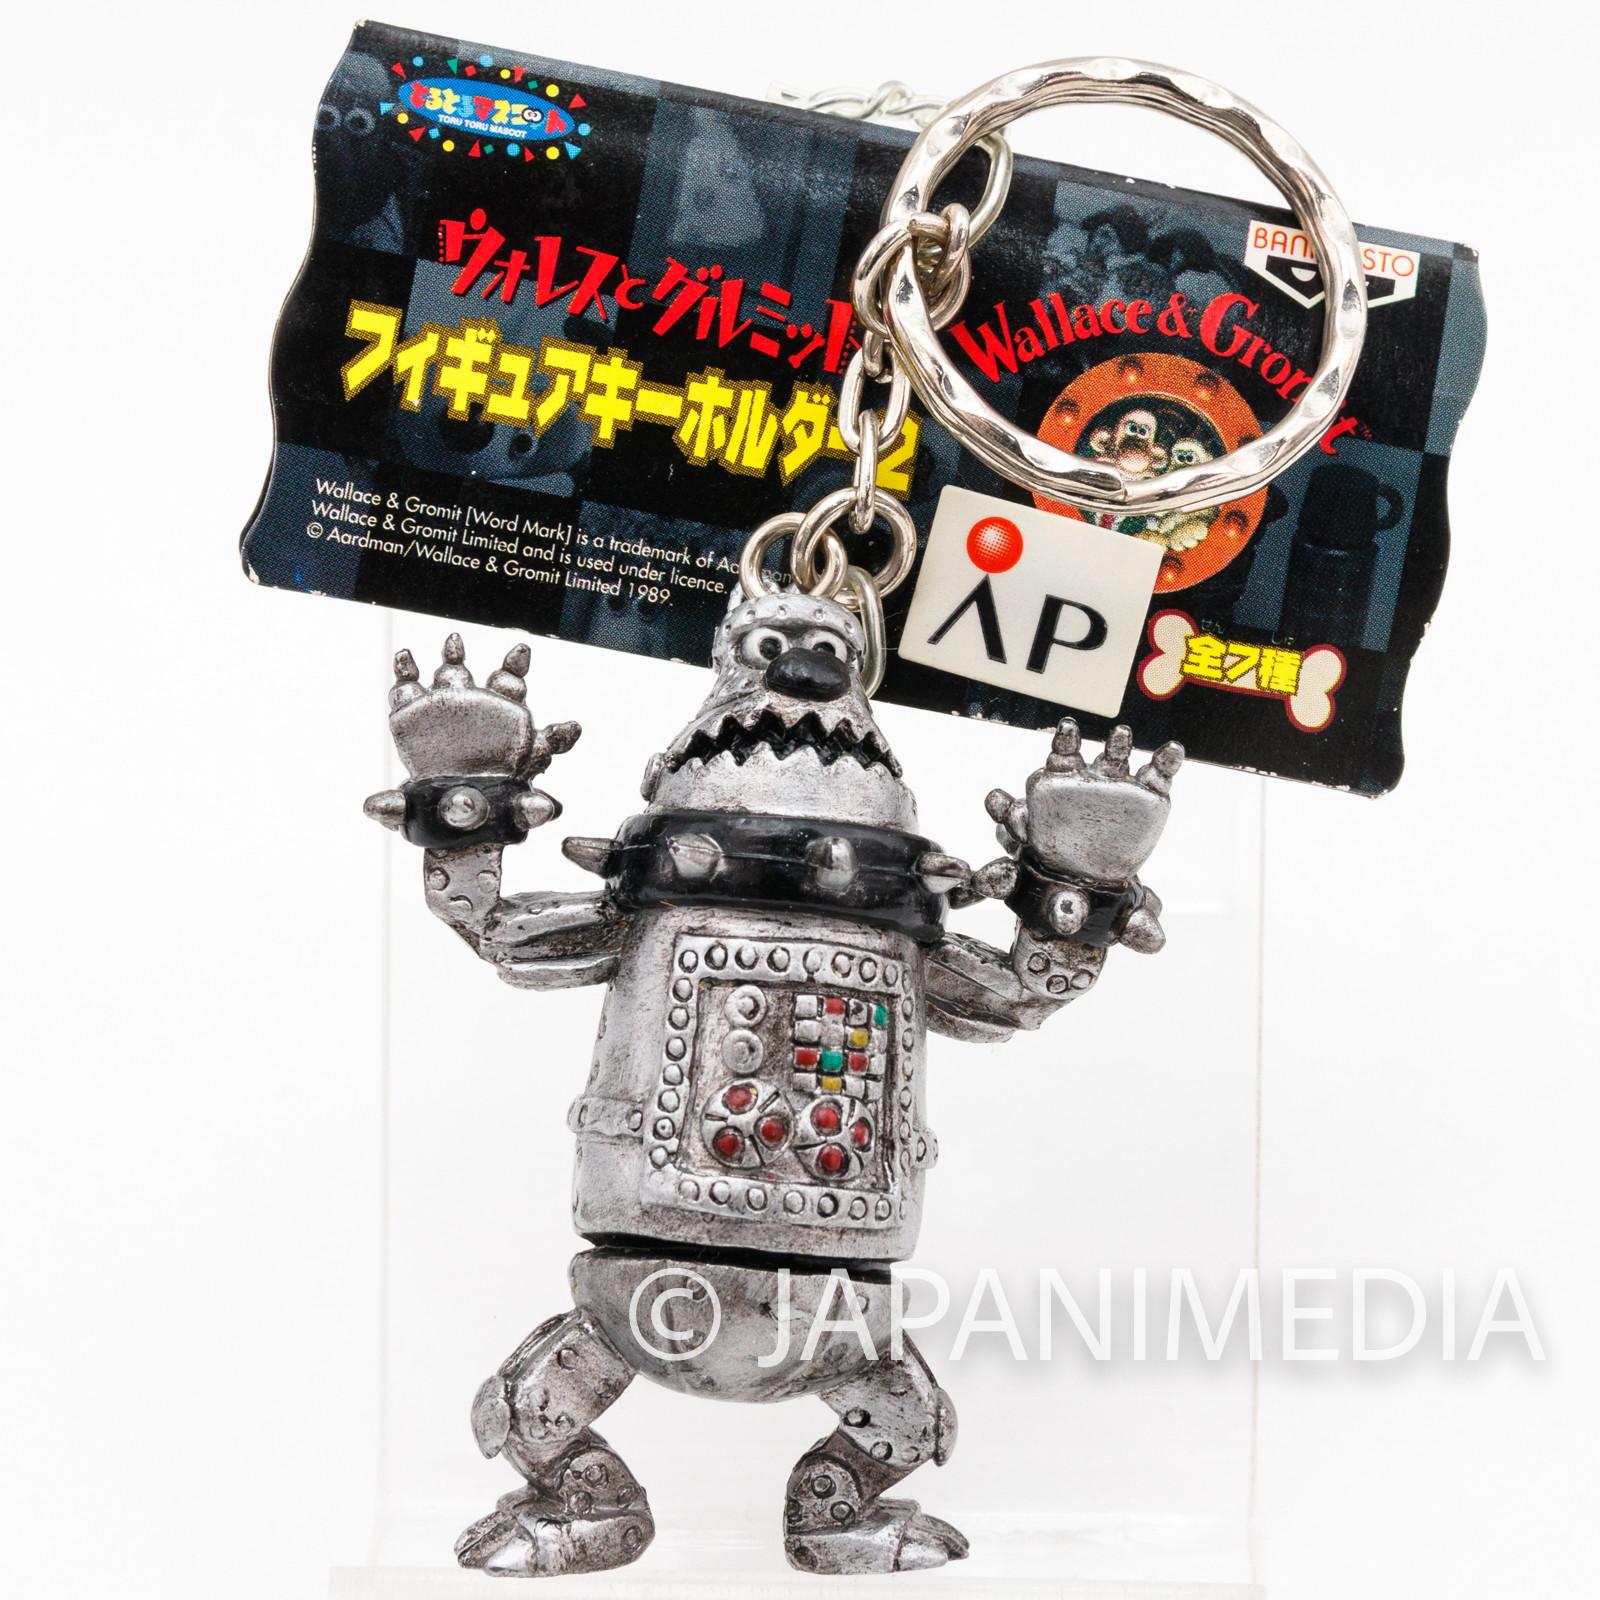 Wallace & Gromit Cyberdog Figure Key Chain 2 Banpresto JAPAN Ardman ANIME